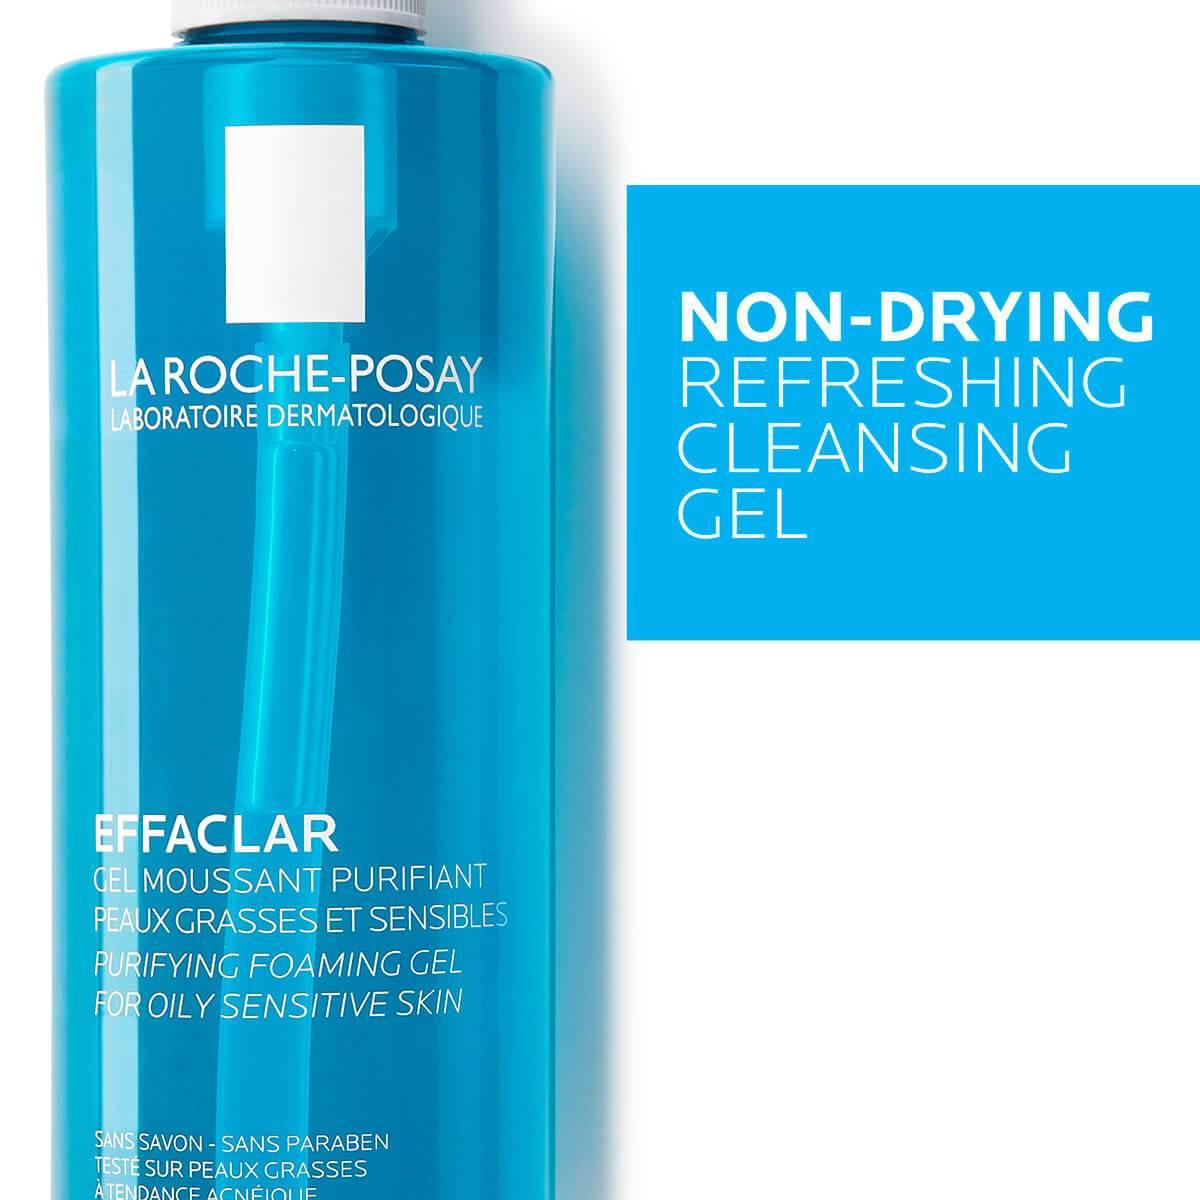 La Roche Posay ProductPage Acne Effaclar Cleansing Foaming Gel 400ml 3